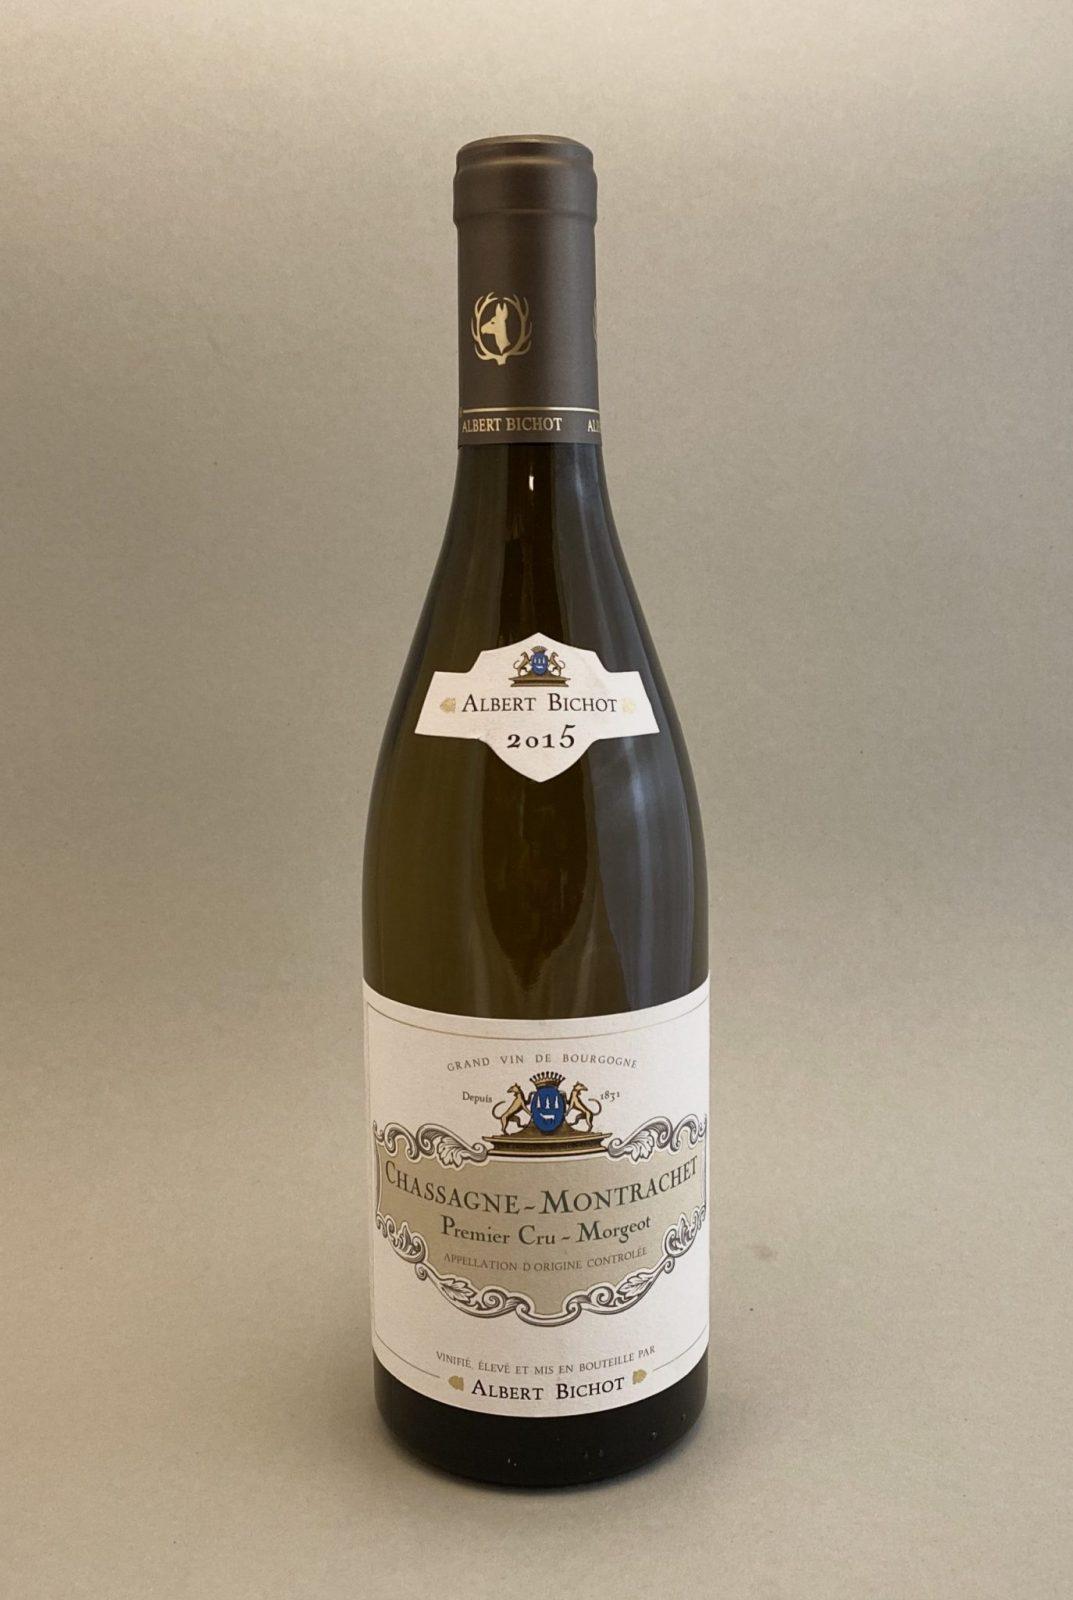 ALBERT BICHOT Chassagne Montrachet 2015, vinoteka Bratislava slnecnice mesto, petrzalka, vino biele z Francúzska